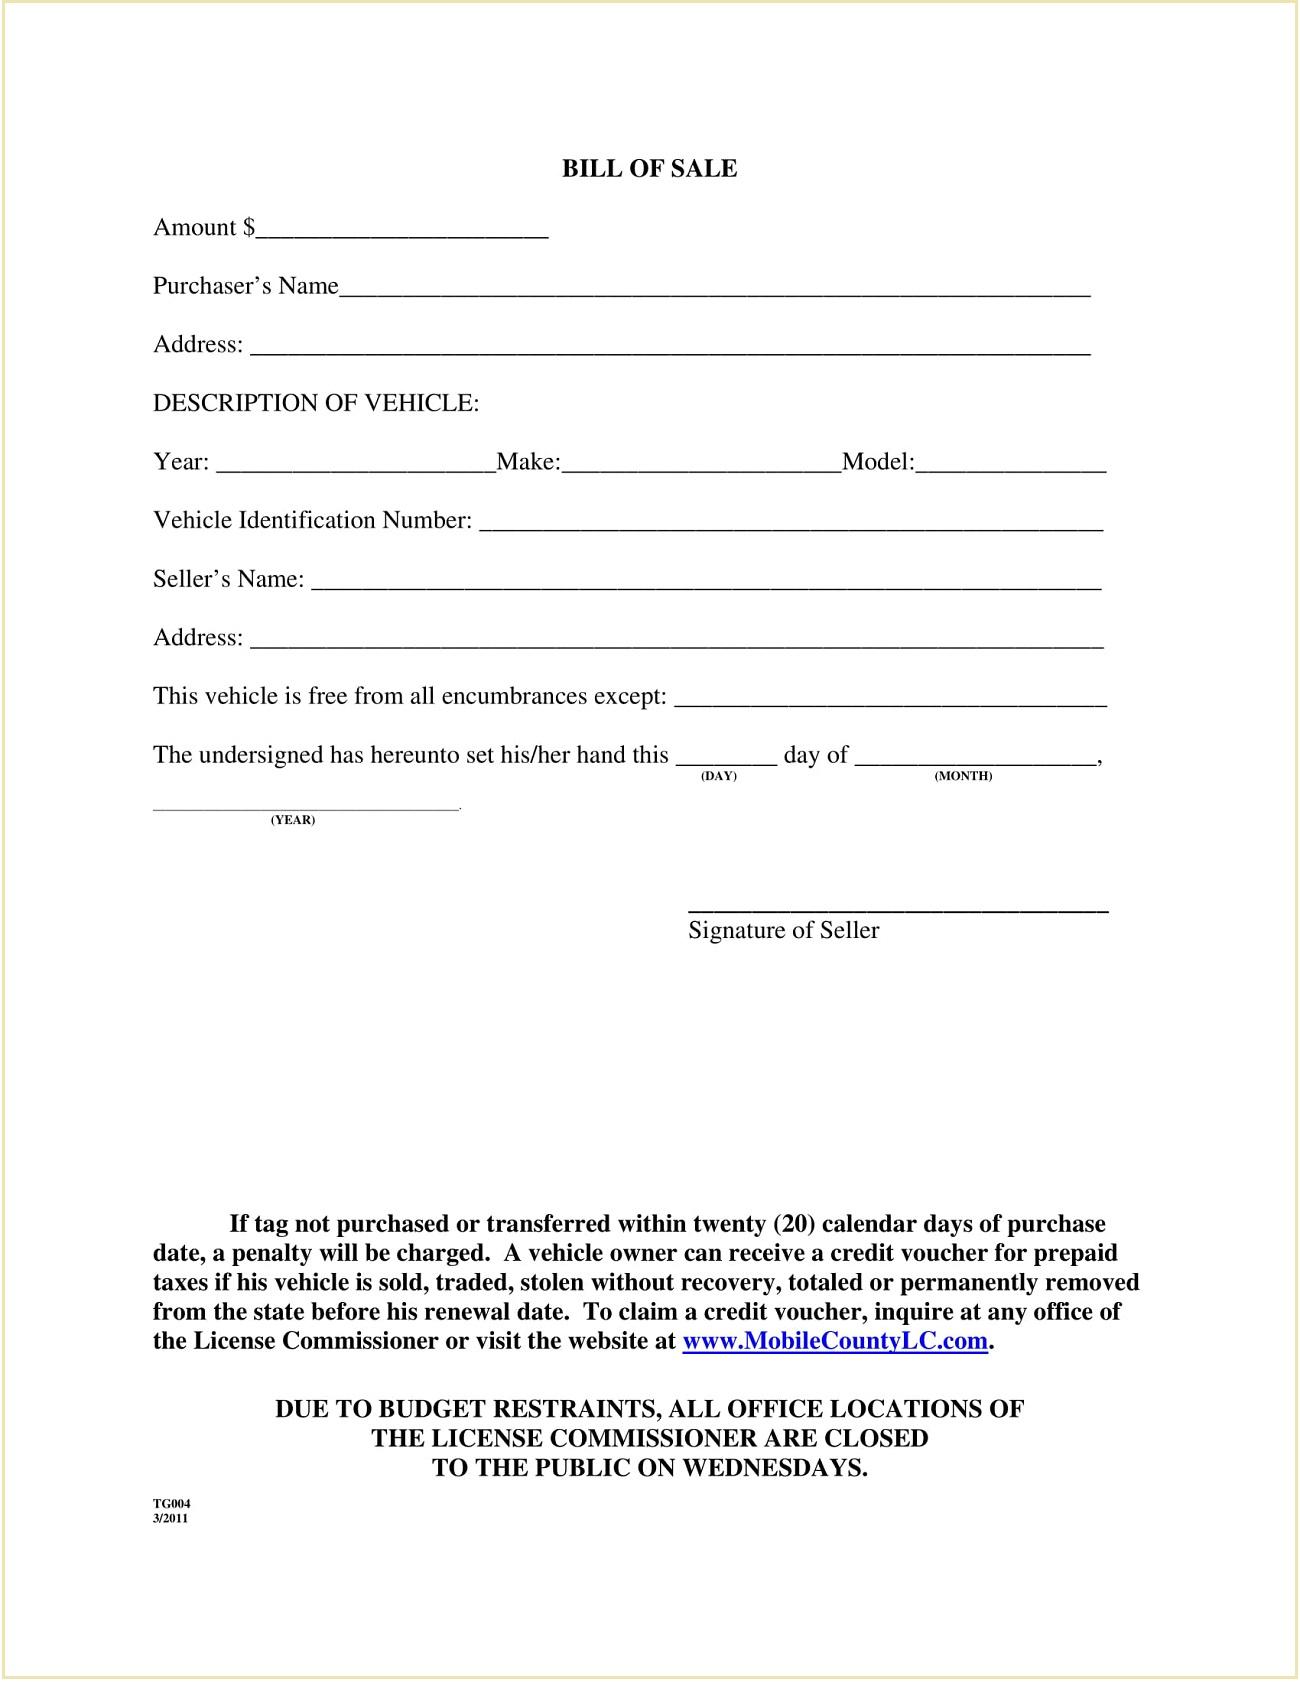 Mobile County DMV Alabama Motor Vehicle Bill of Sale Form Template PDF